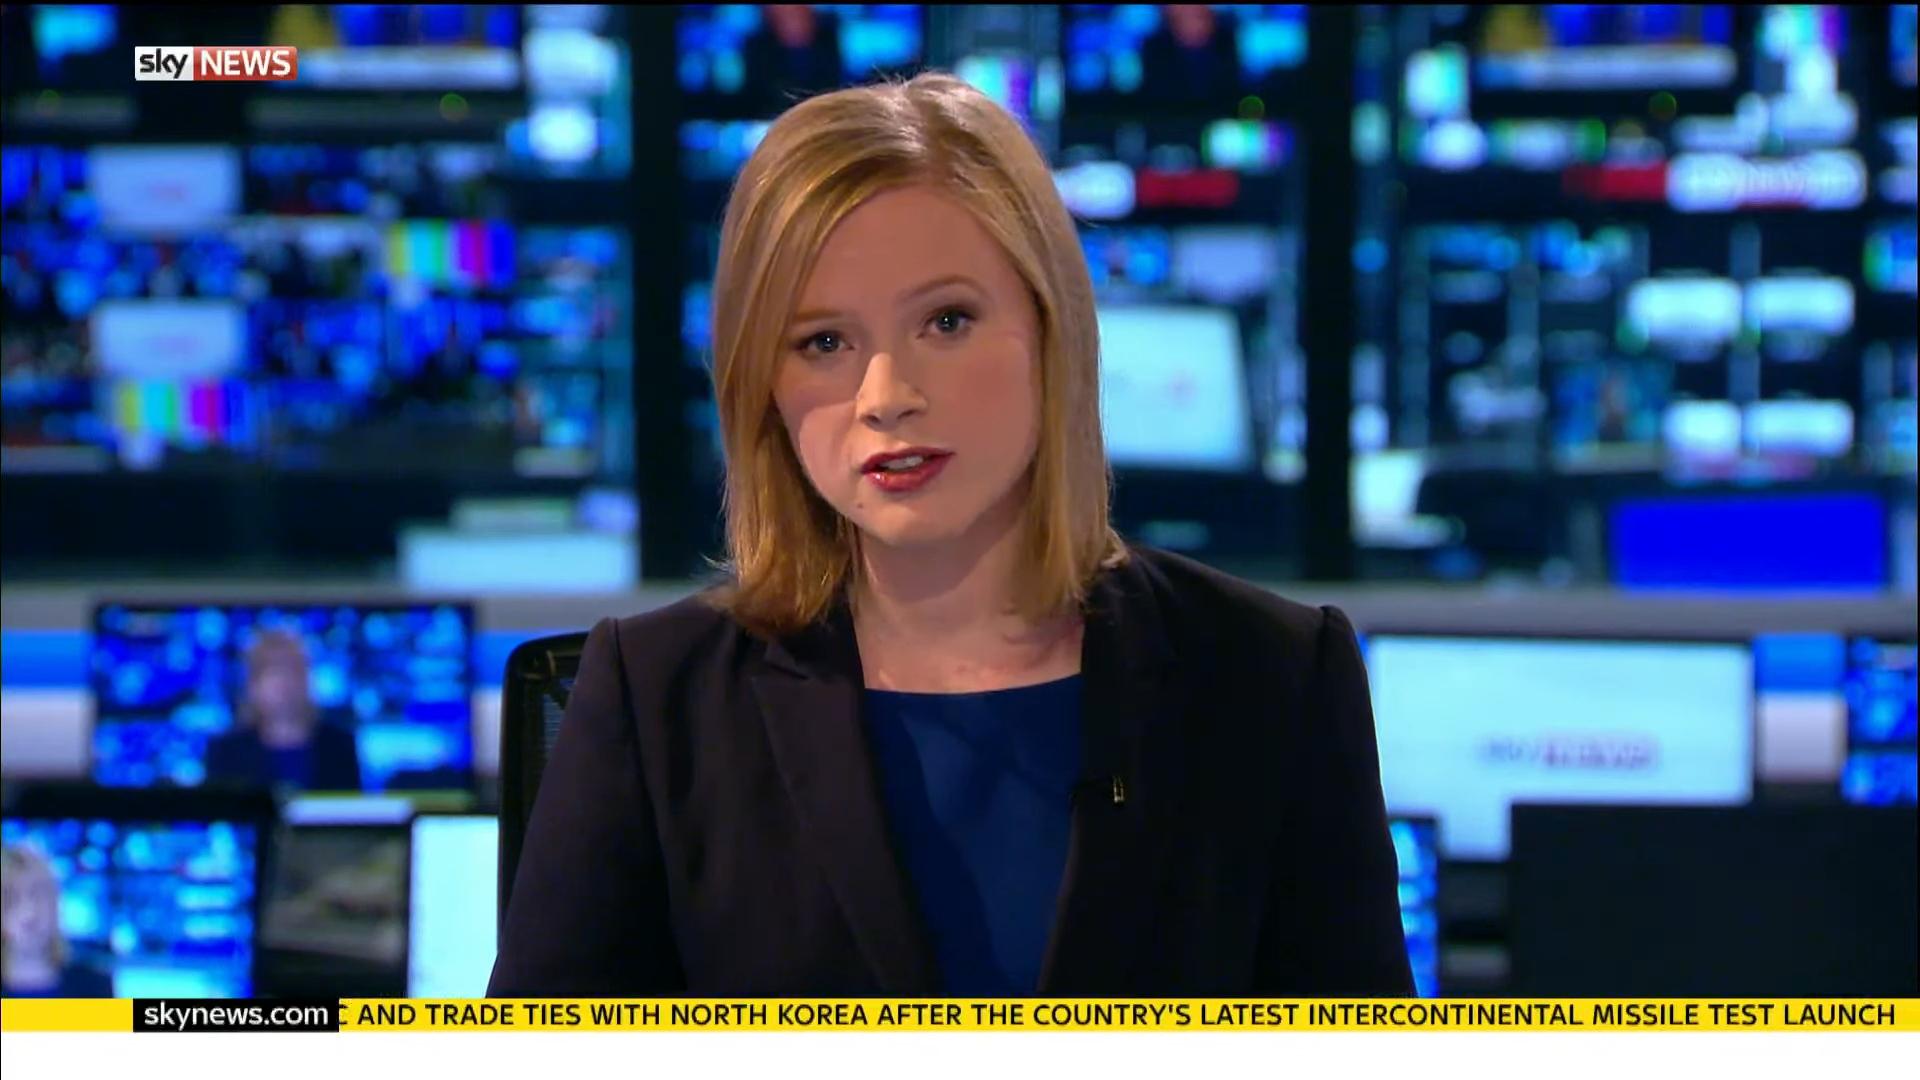 Lorna Shaddick - Sky News Presenter (1)